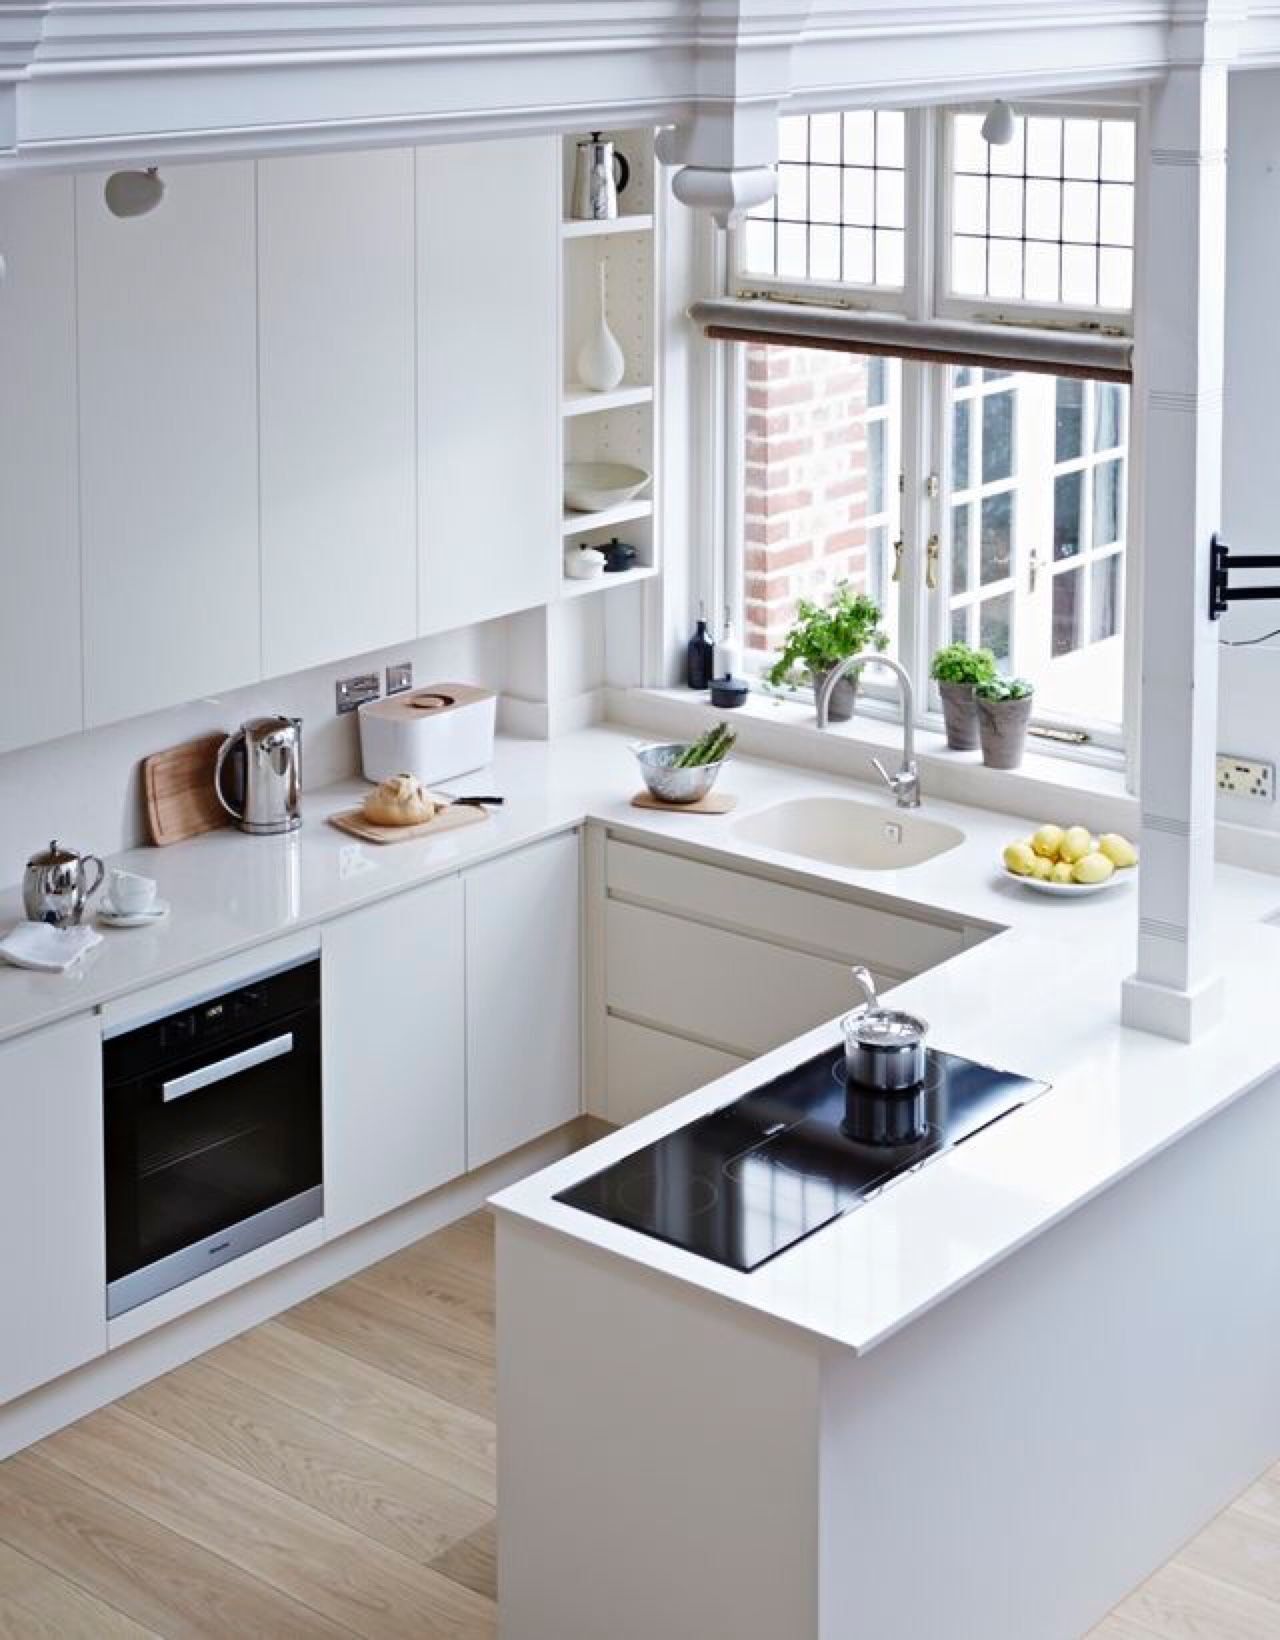 Küche einrichten ideen  An interior is the natural projection of the soul. — Whiteness ...